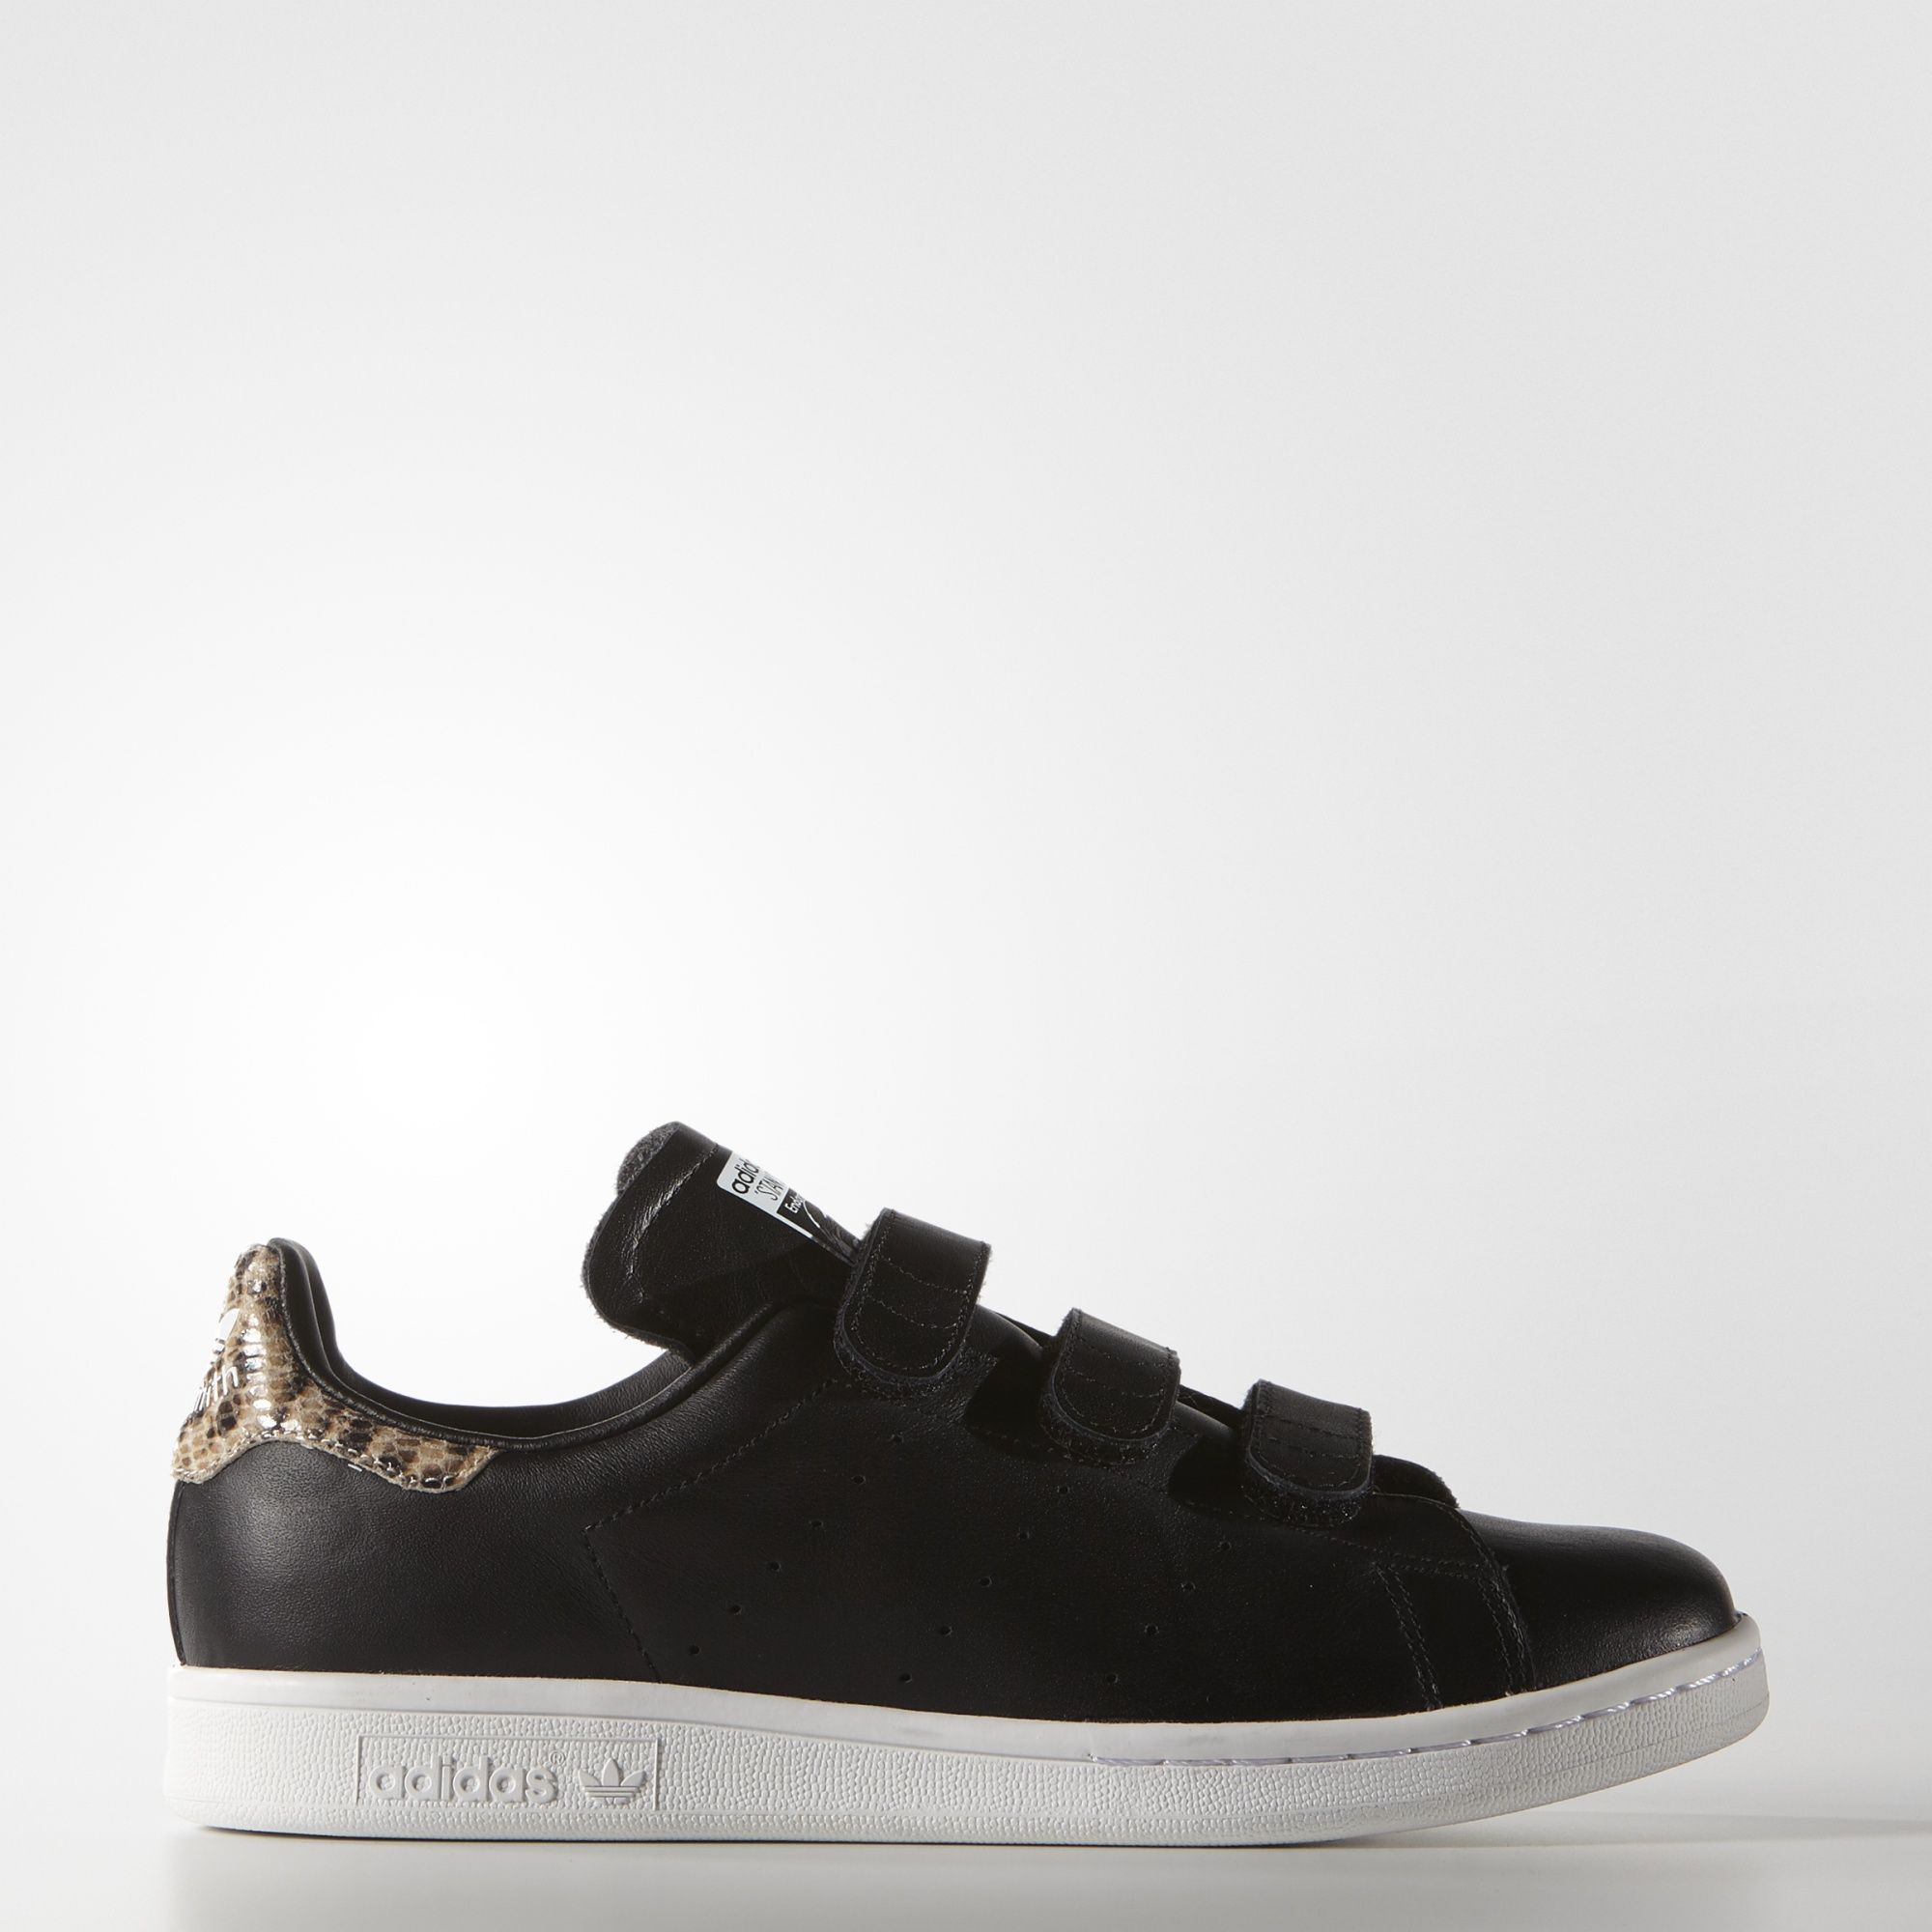 le scarpe sportive adidas stan smith stile pinterest